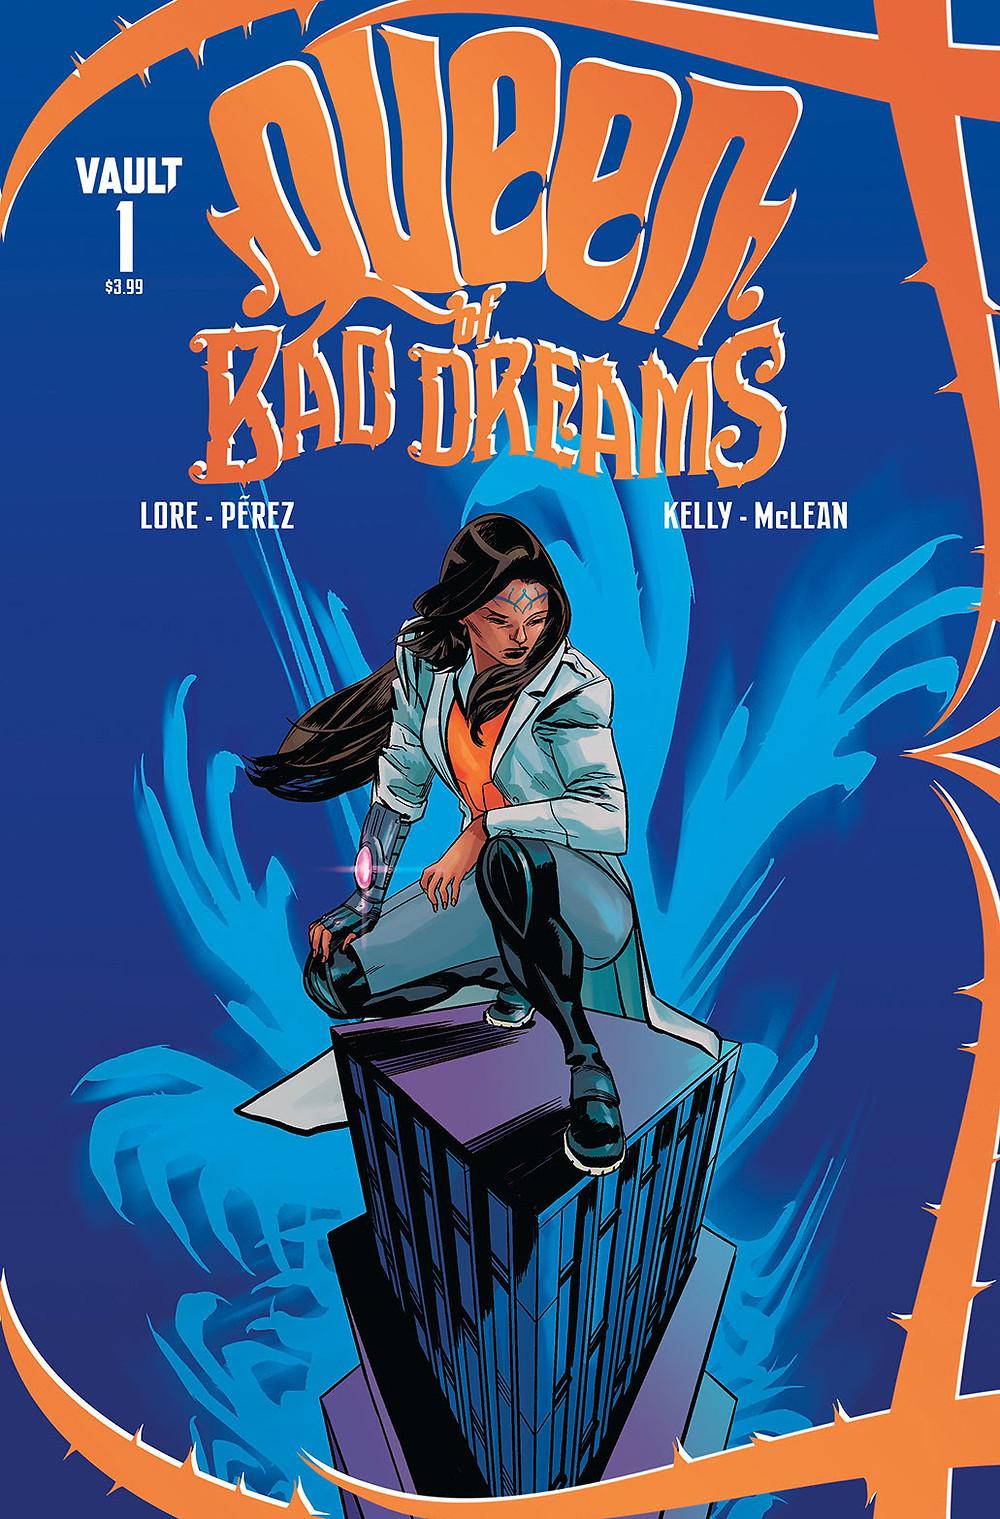 Queen of Bad Dreams, issue #1, cover, Vault Comics, Lore/Pérez